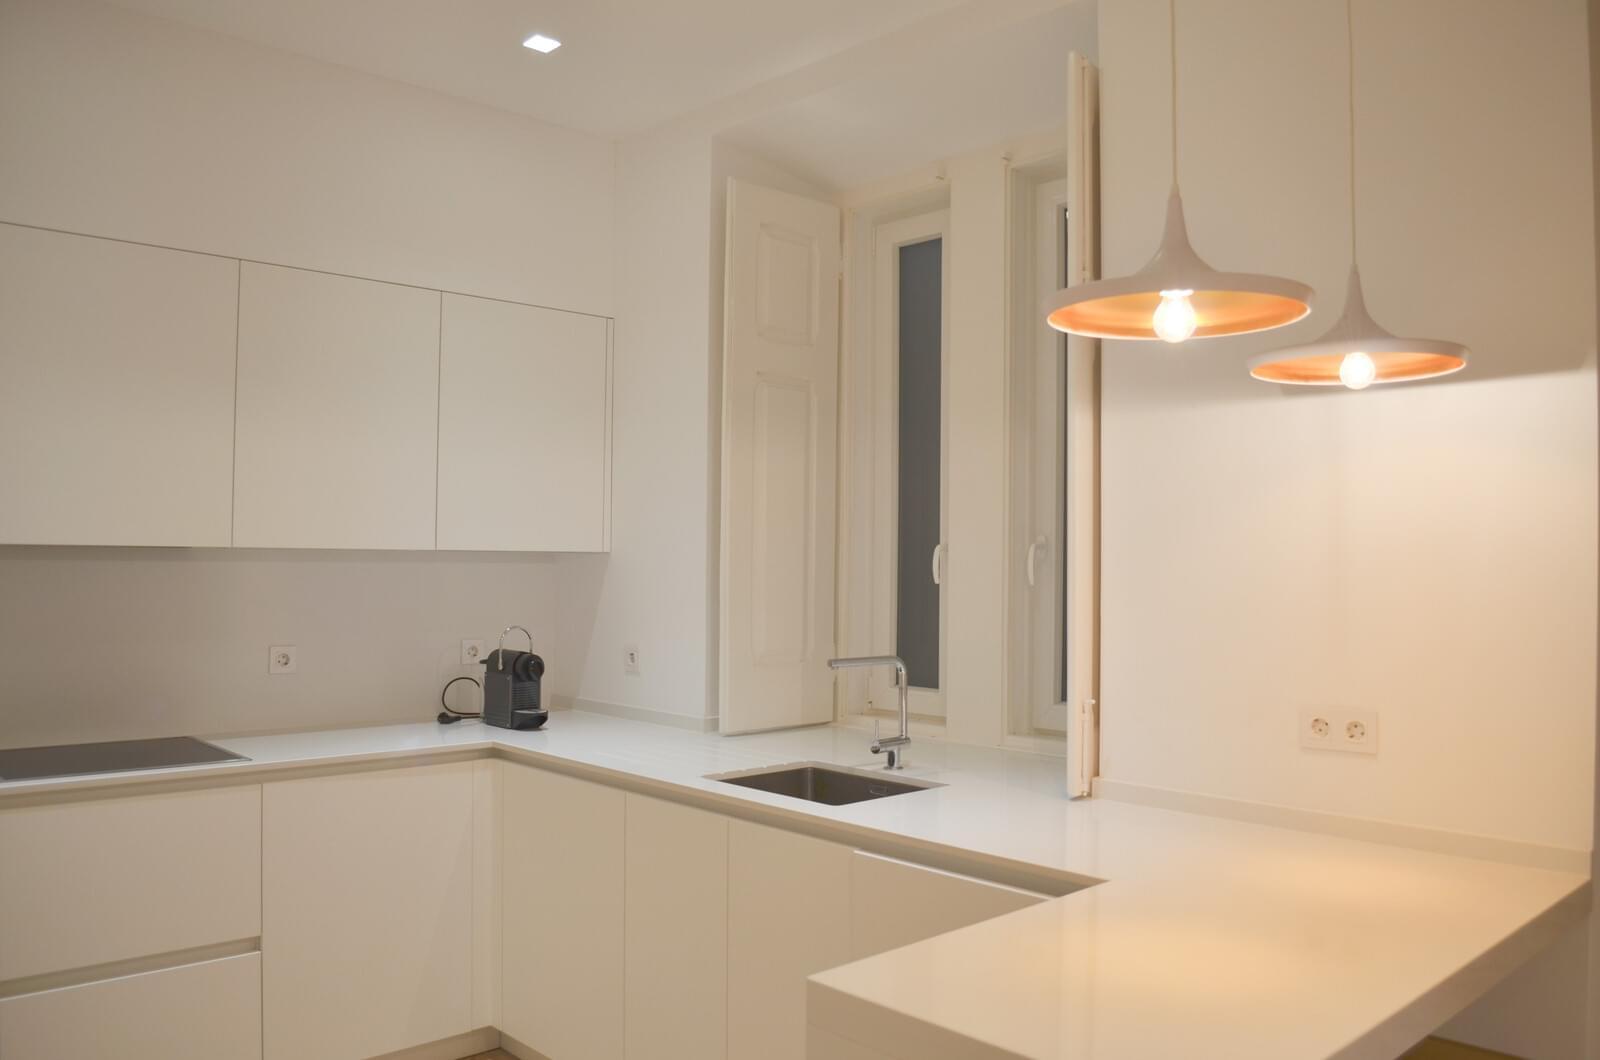 pf18801-apartamento-t2-lisboa-334c89ee-cd4d-4ddc-81de-3b3f0e4d5430